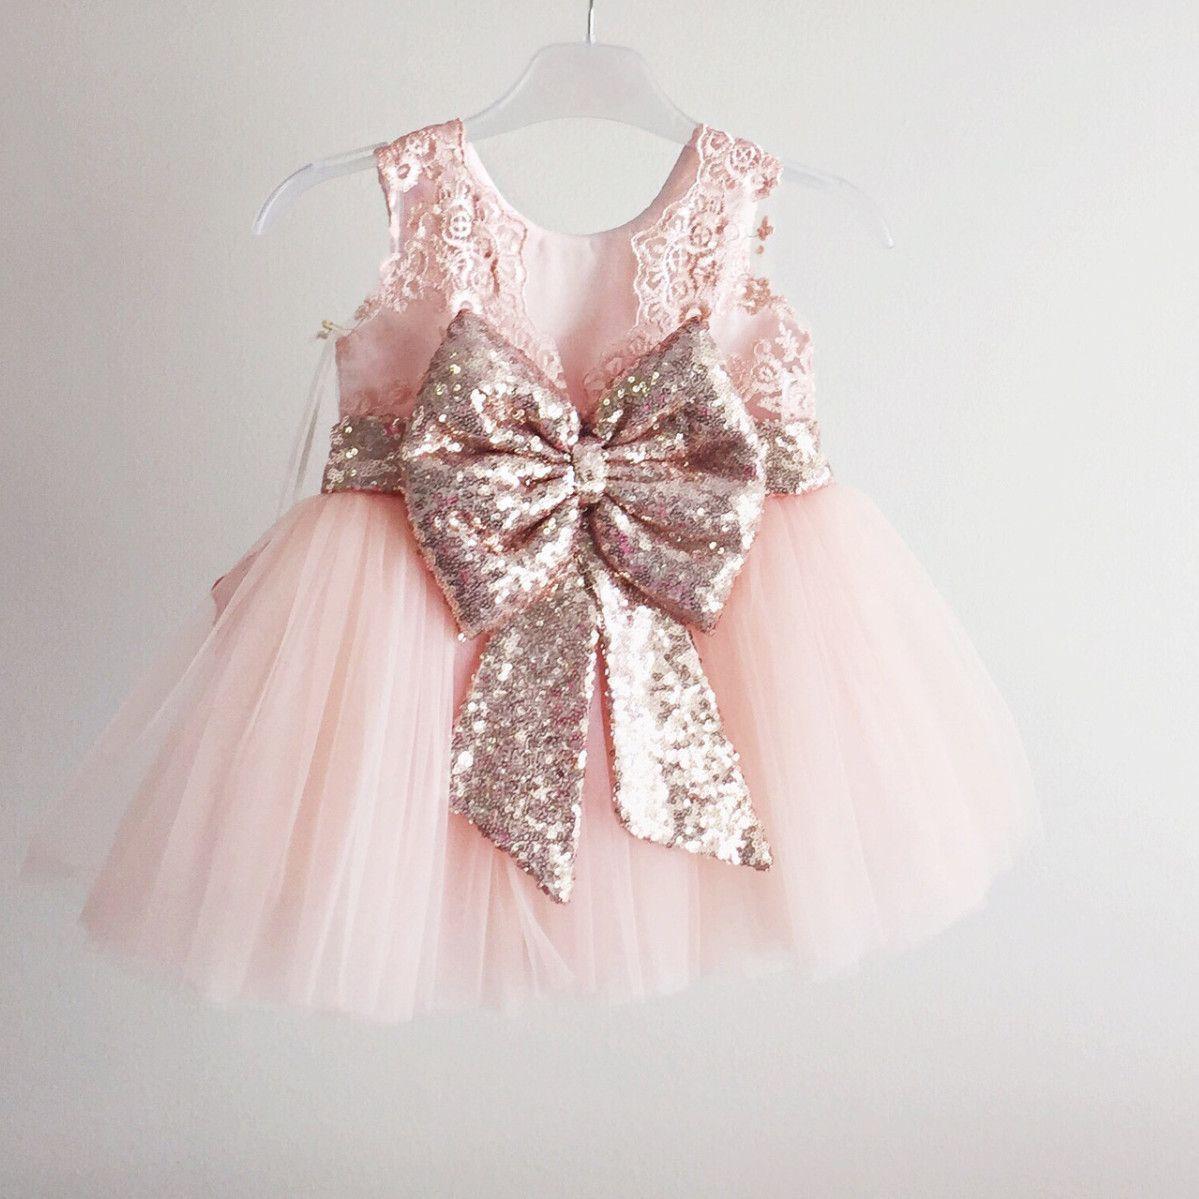 de708964d Princess Aisha Dress (Rose Gold) Vestidos De Niña Elegantes